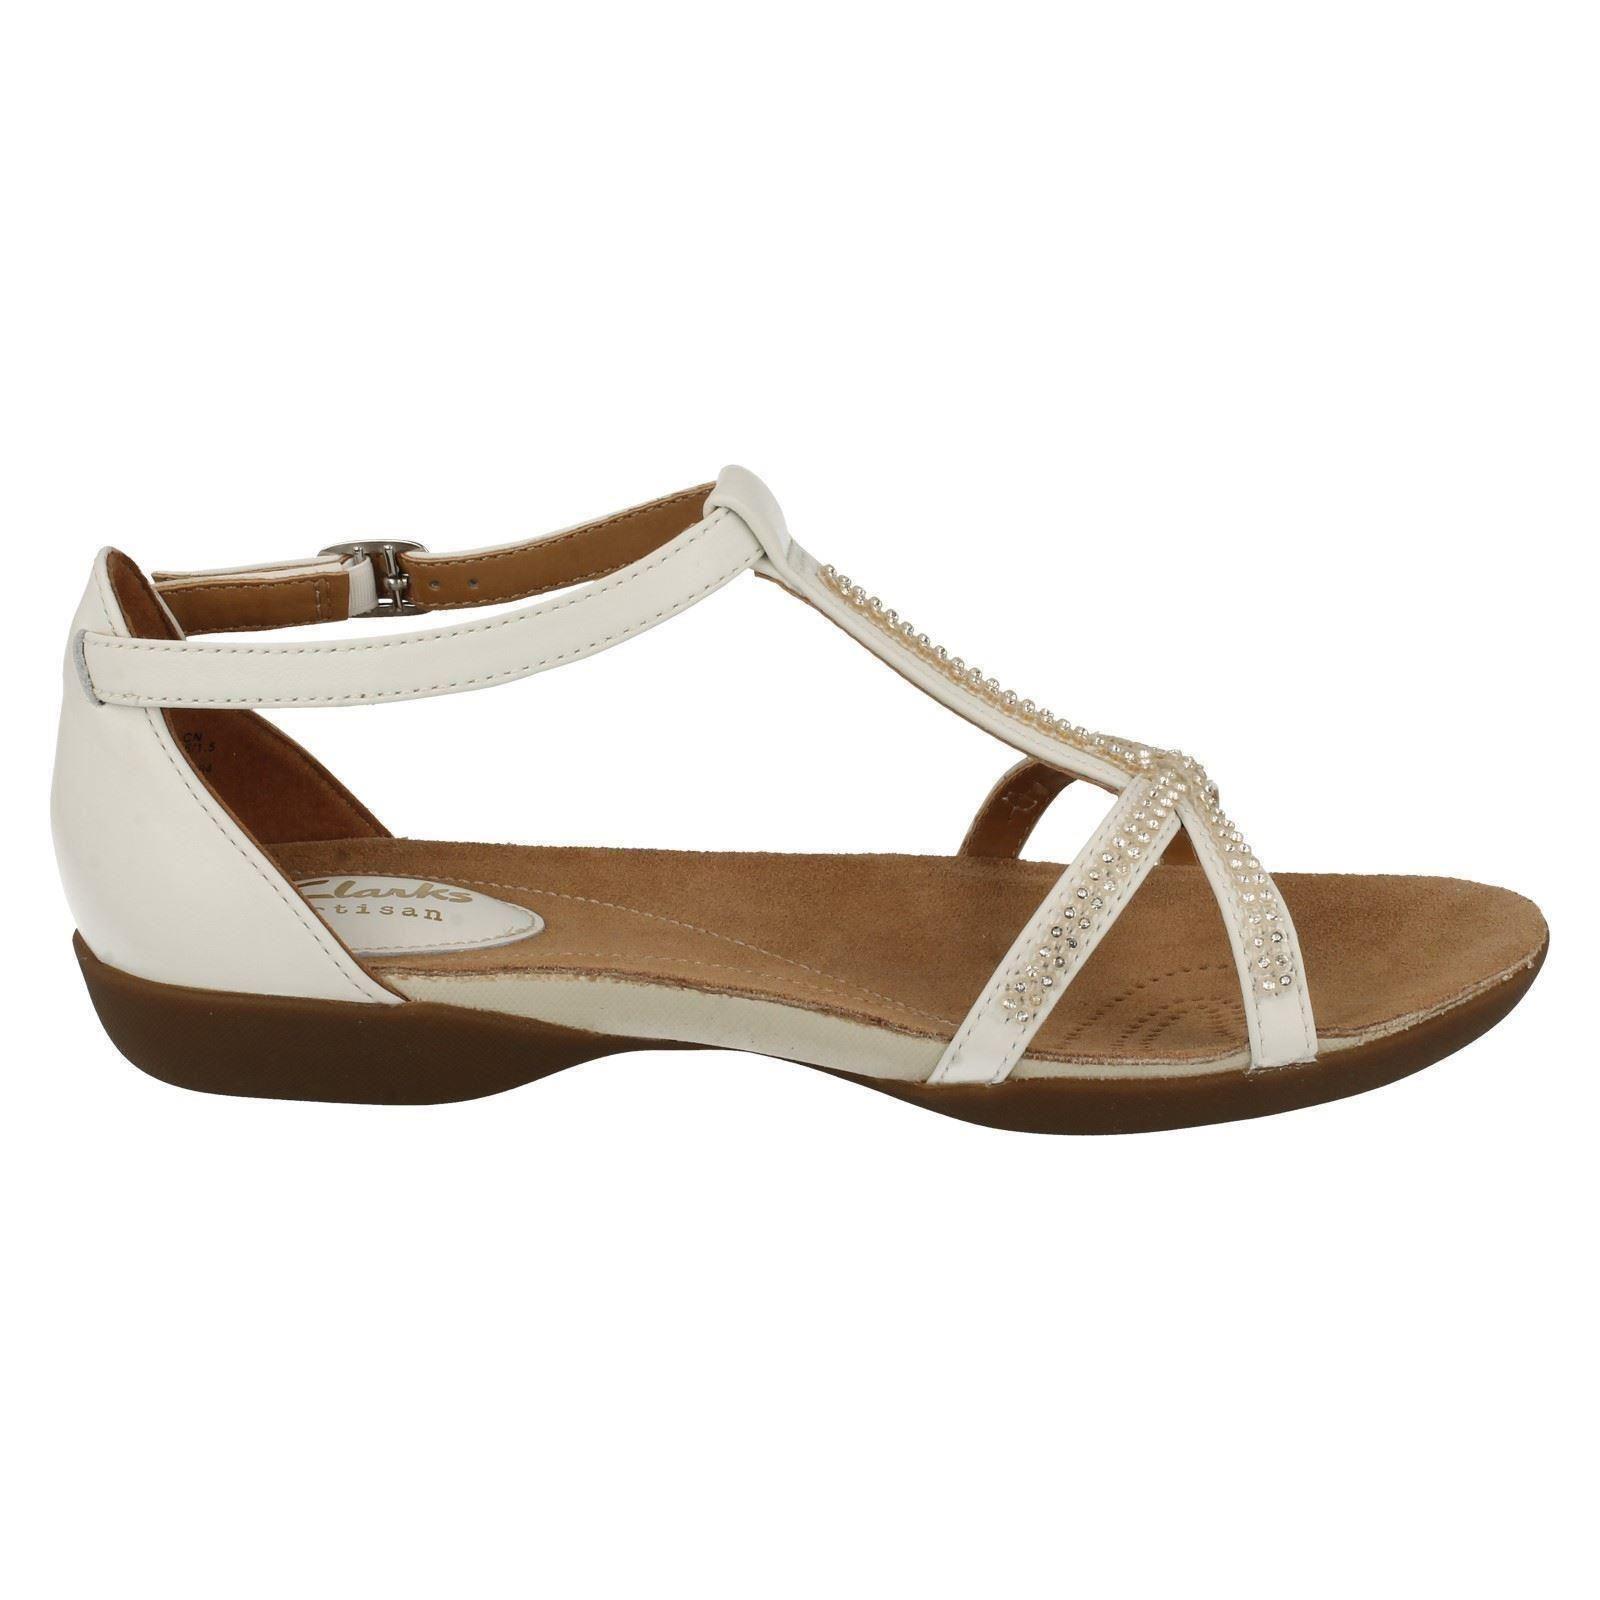 efff97da8be09 Ladies Clarks T-Bar Flat Summer Sandals  Raffi Star